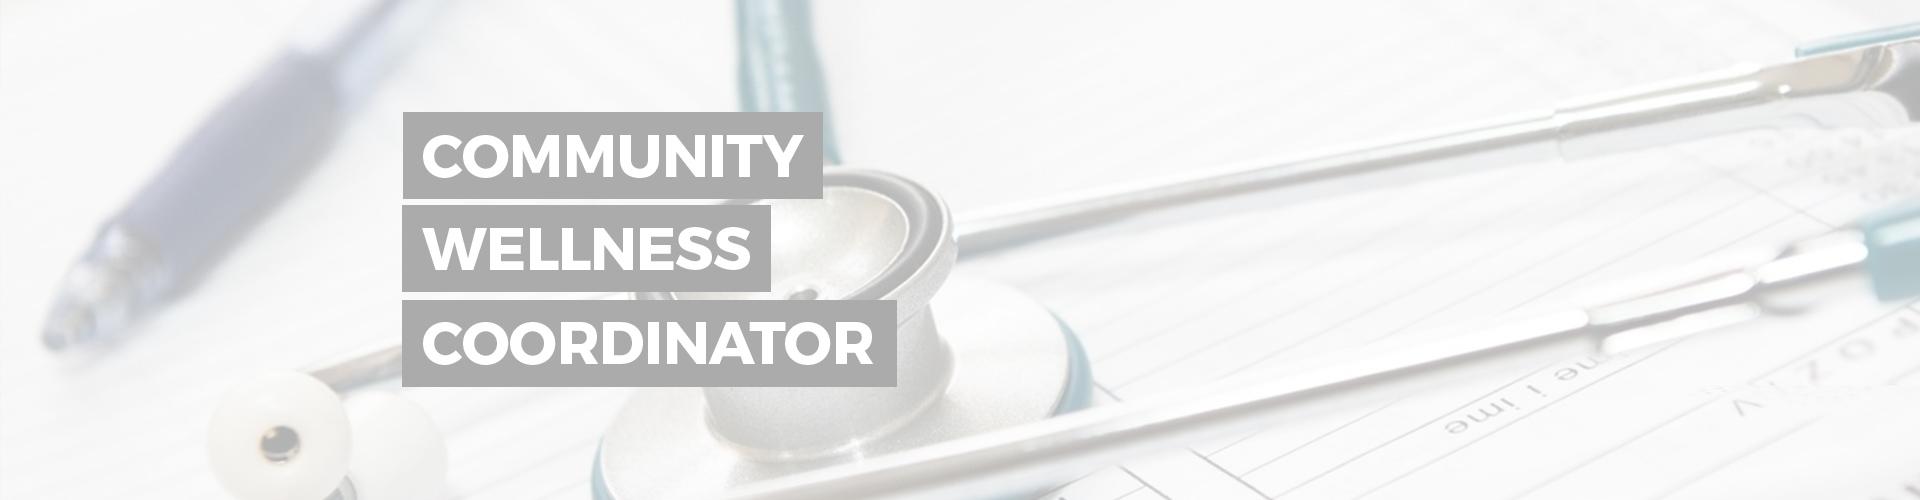 community-wellness-coordinator-grey-header